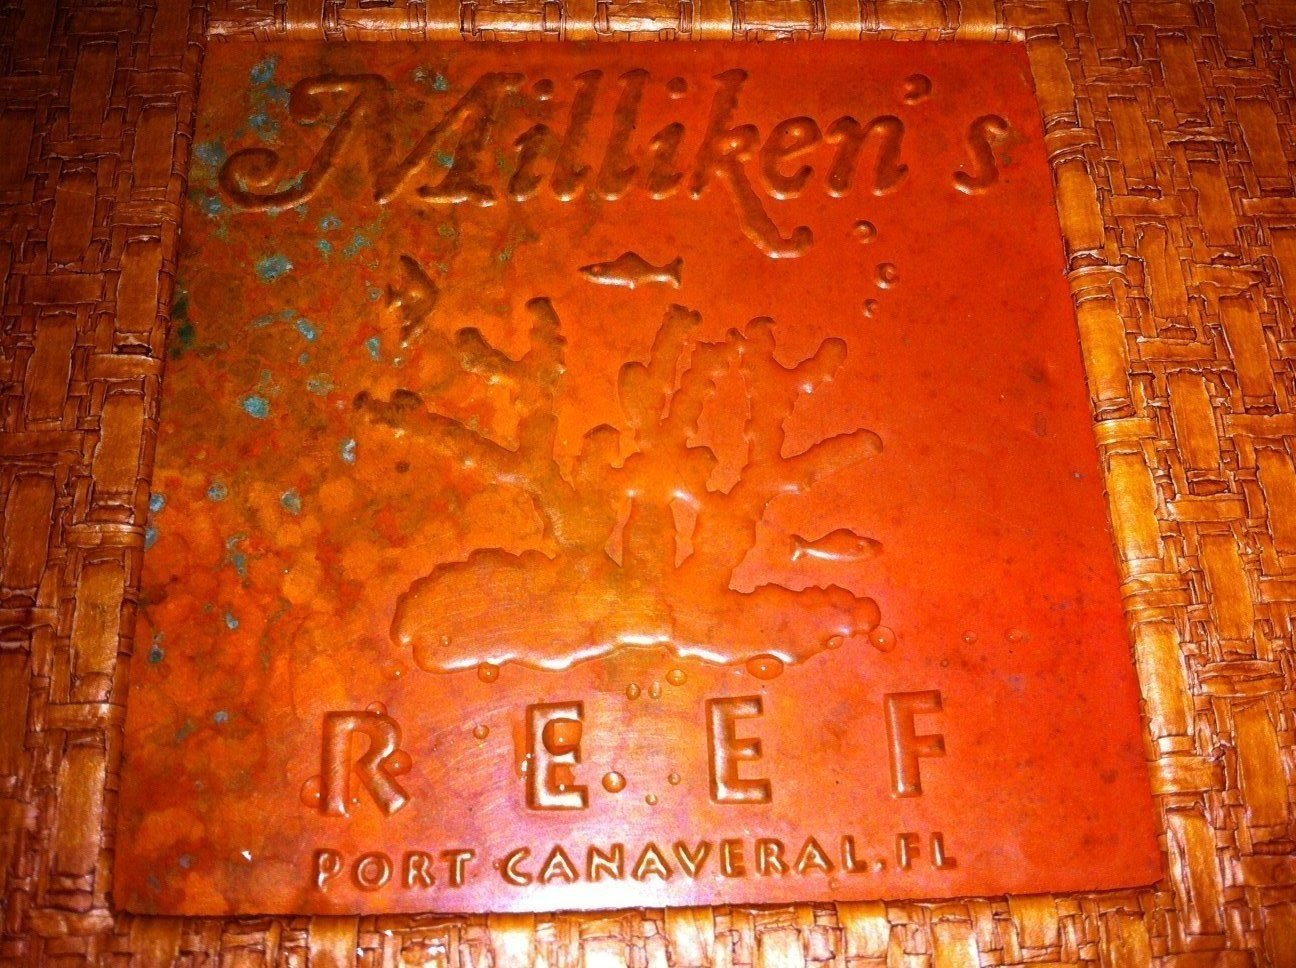 Millikens Reef